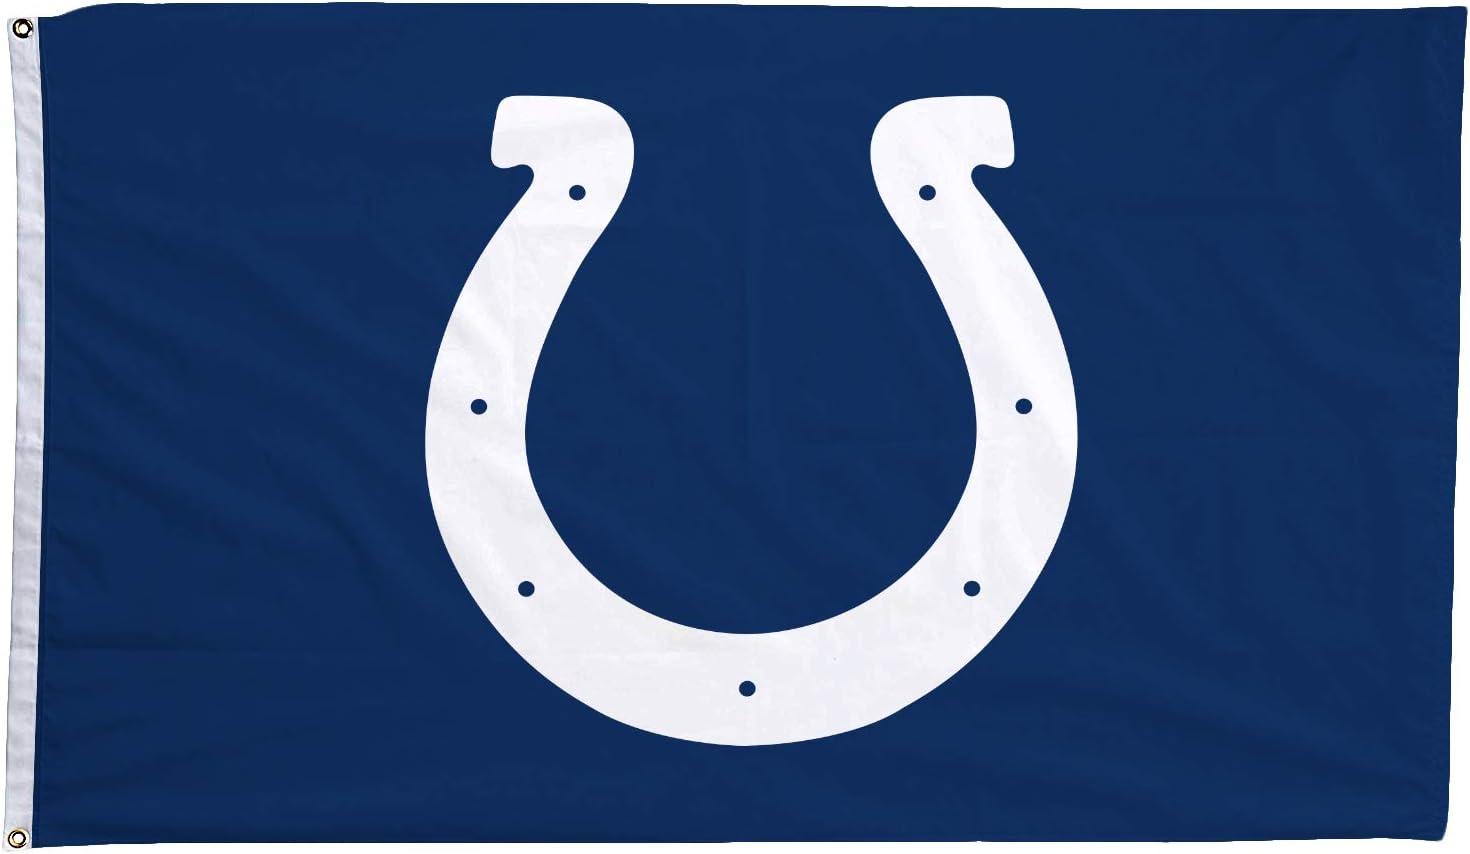 LEMOISTARS NFL Teams Big Logo 3 X 5 Double Sided Fans Banner Champion Flag with 2 Grommets Extra Durability